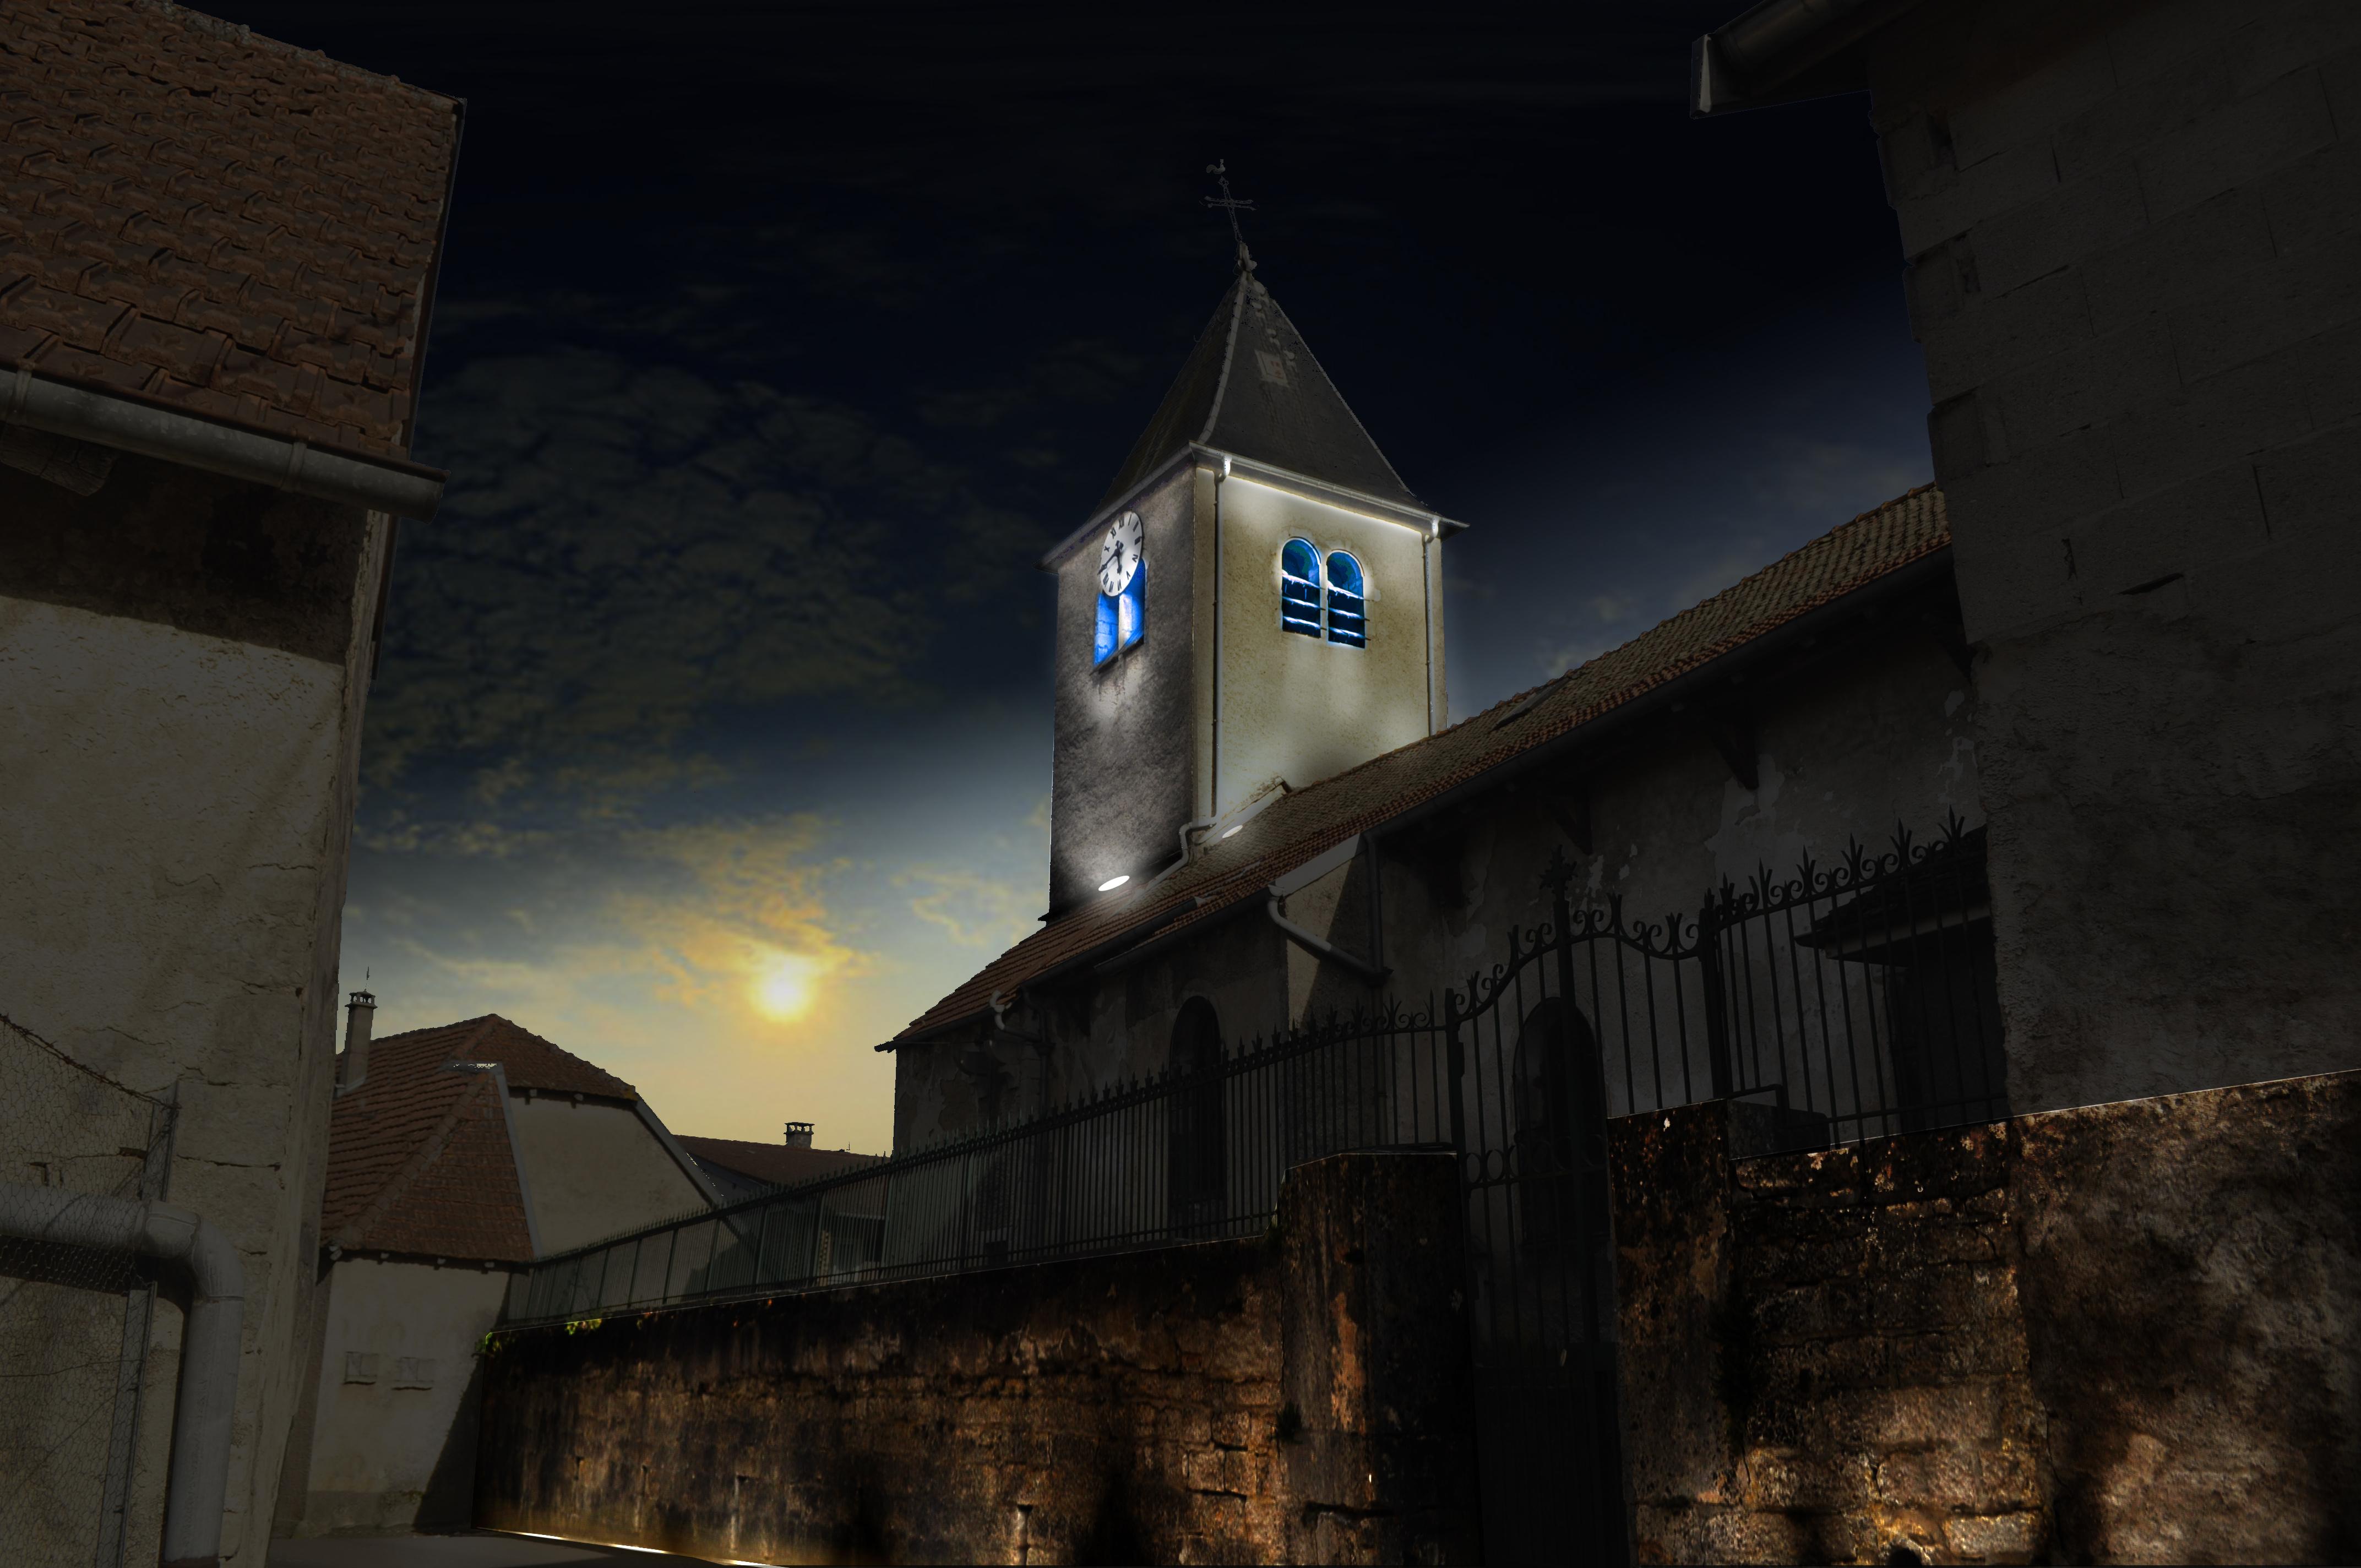 MEV_Noncourt_Eglise Sainte-Ursule